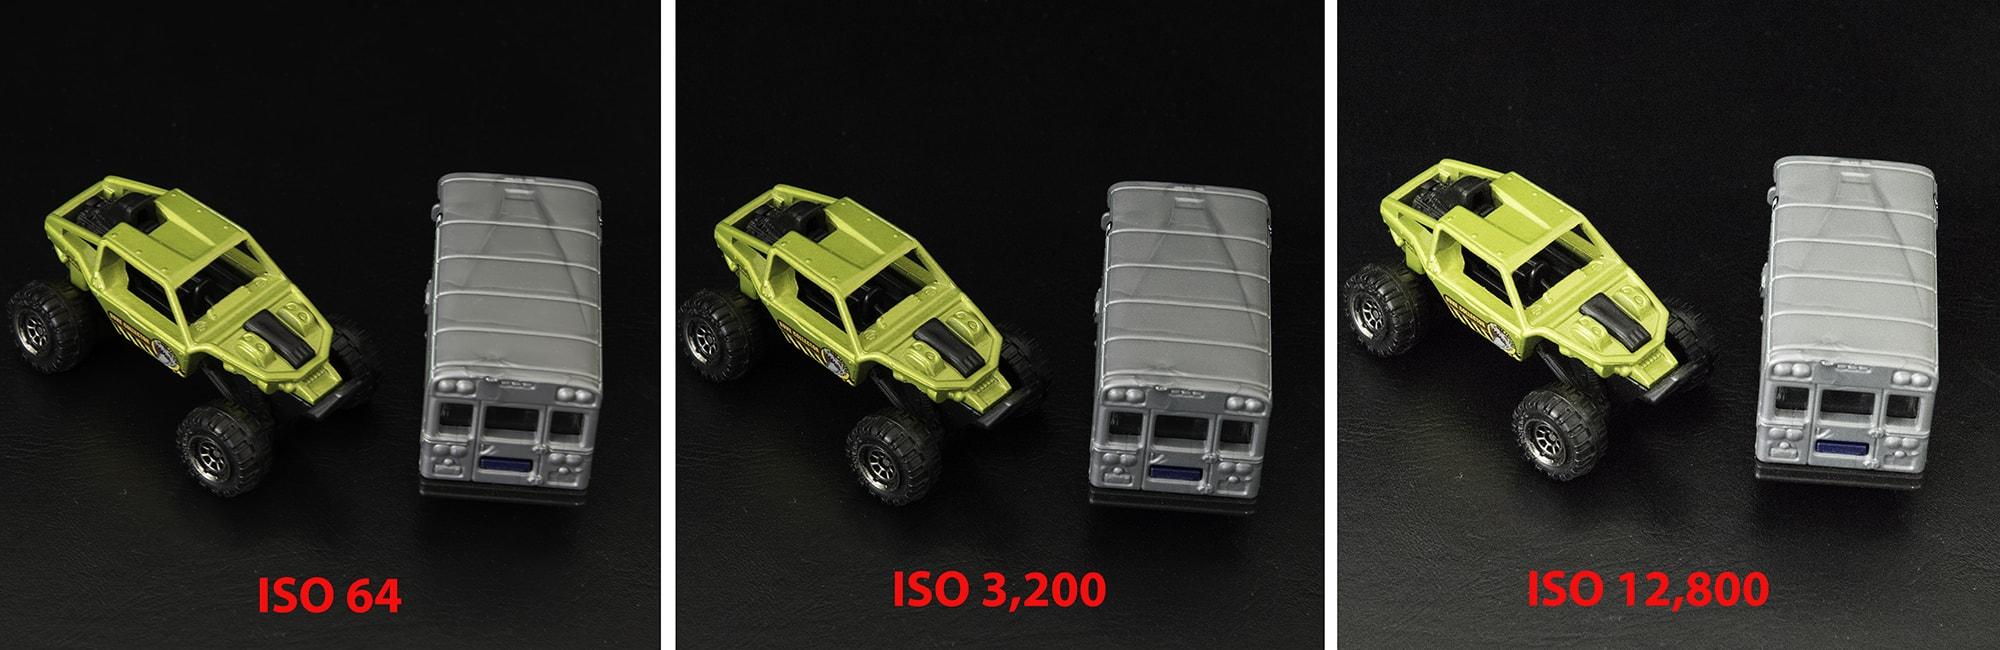 ISO 3 min image